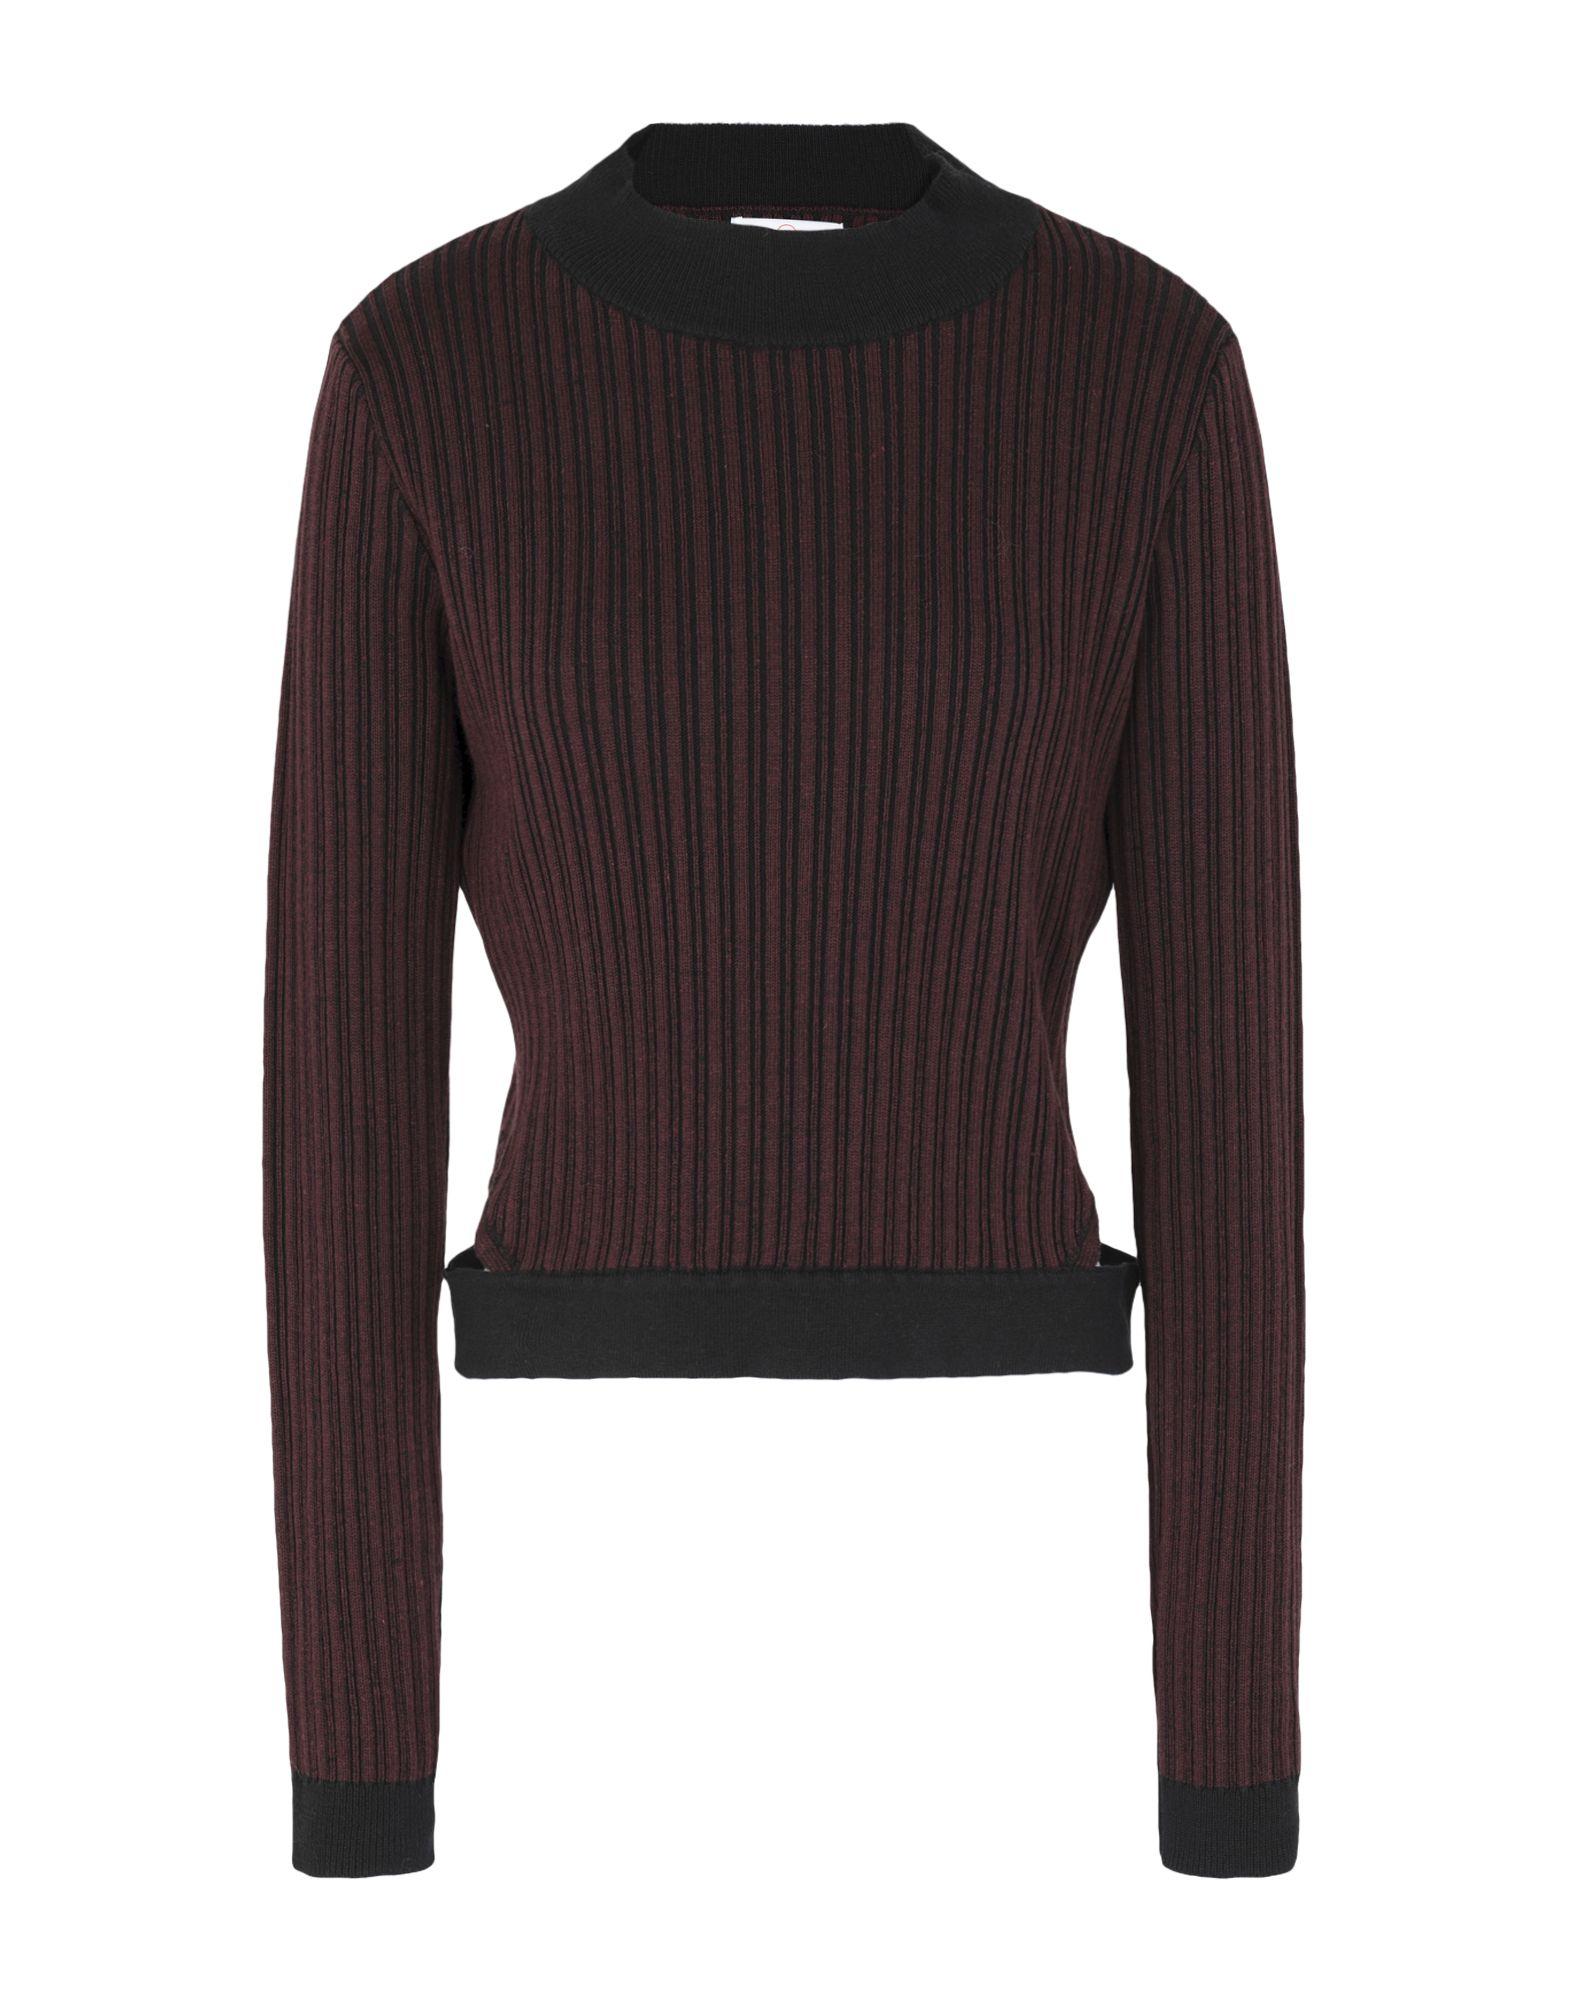 GEORGE J. LOVE Свитер мужской свитер в полоску 52